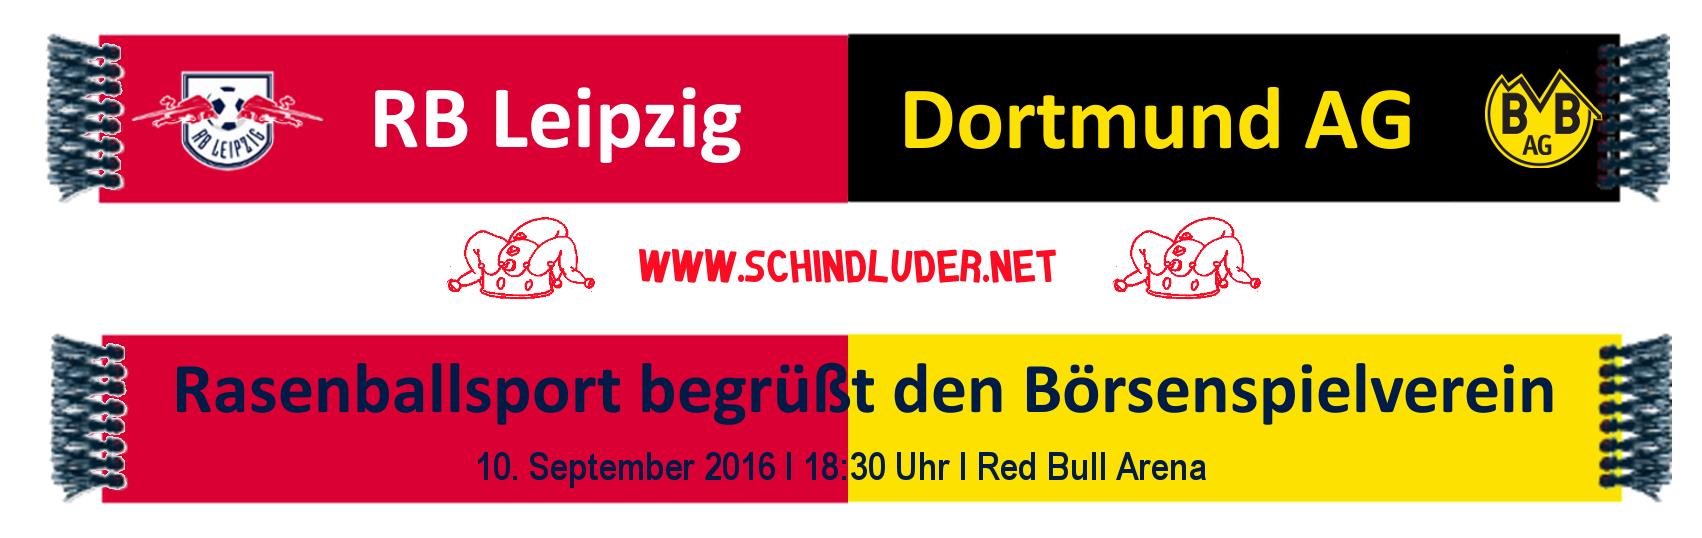 Konsensvorschlag für RBL BVB Fanschal